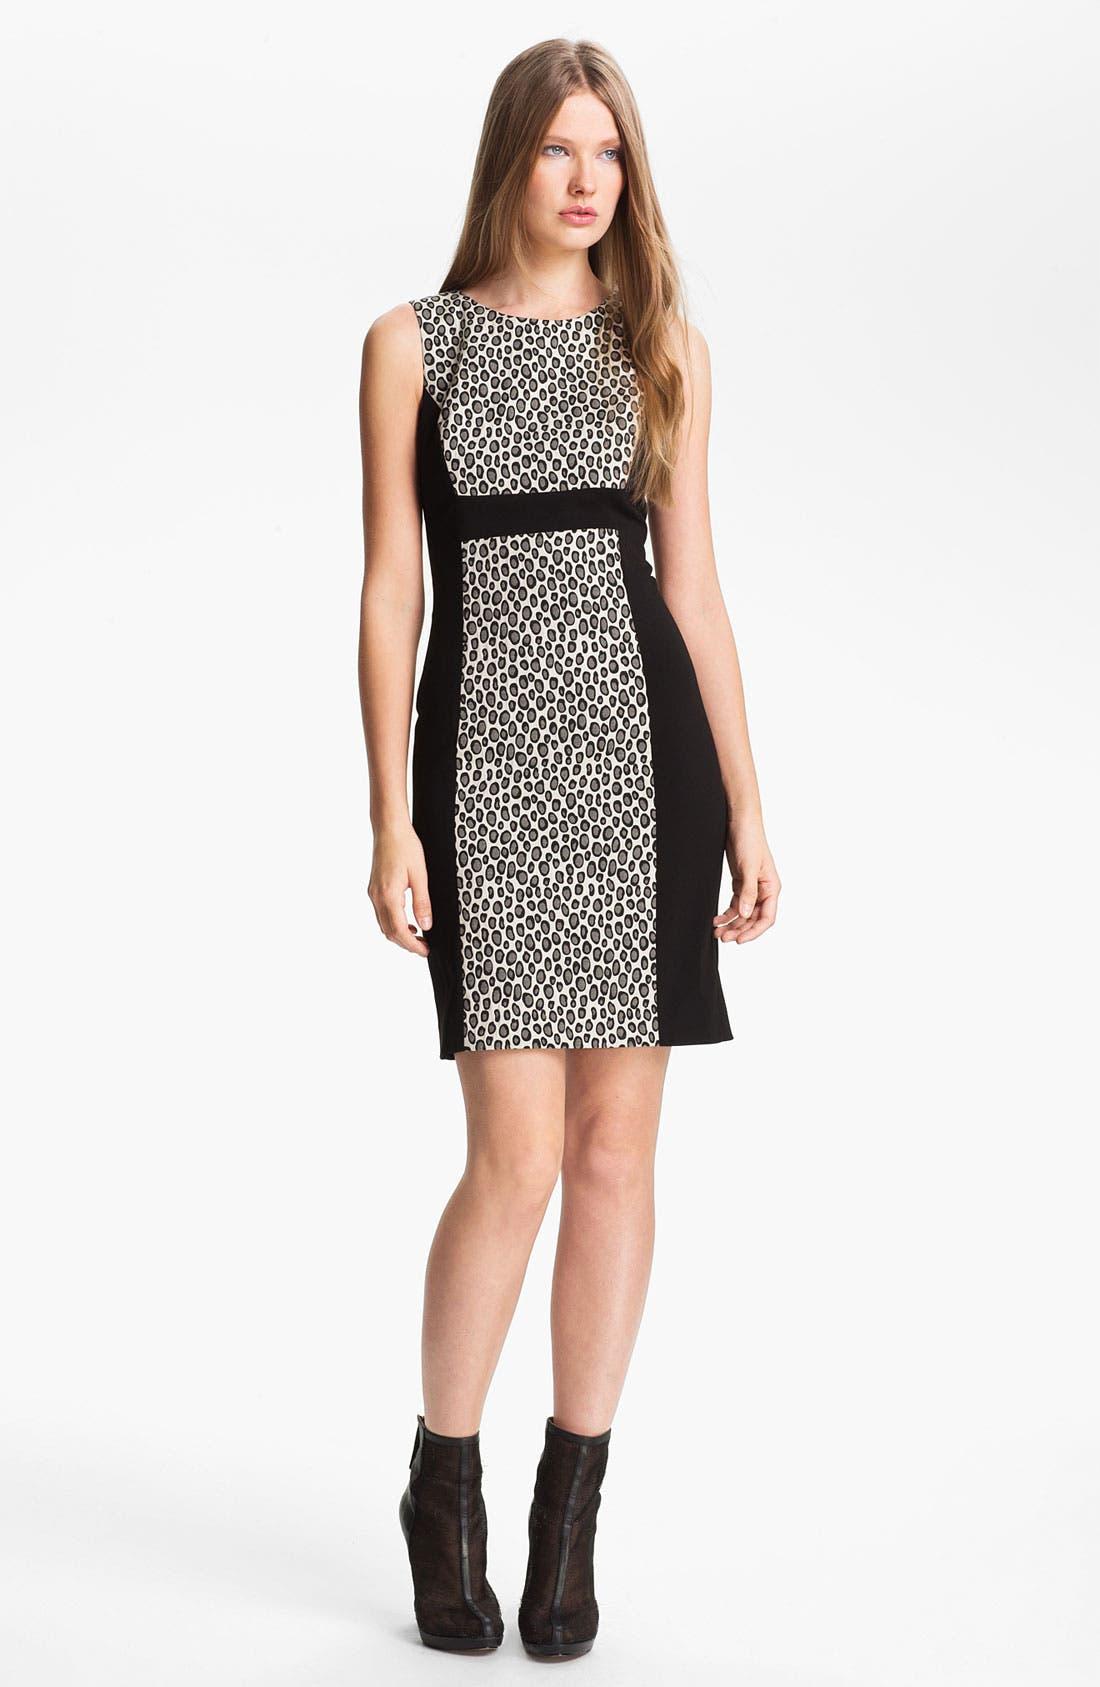 Alternate Image 1 Selected - Rachel Zoe 'Ricky' Contrast Panel Sheath Dress